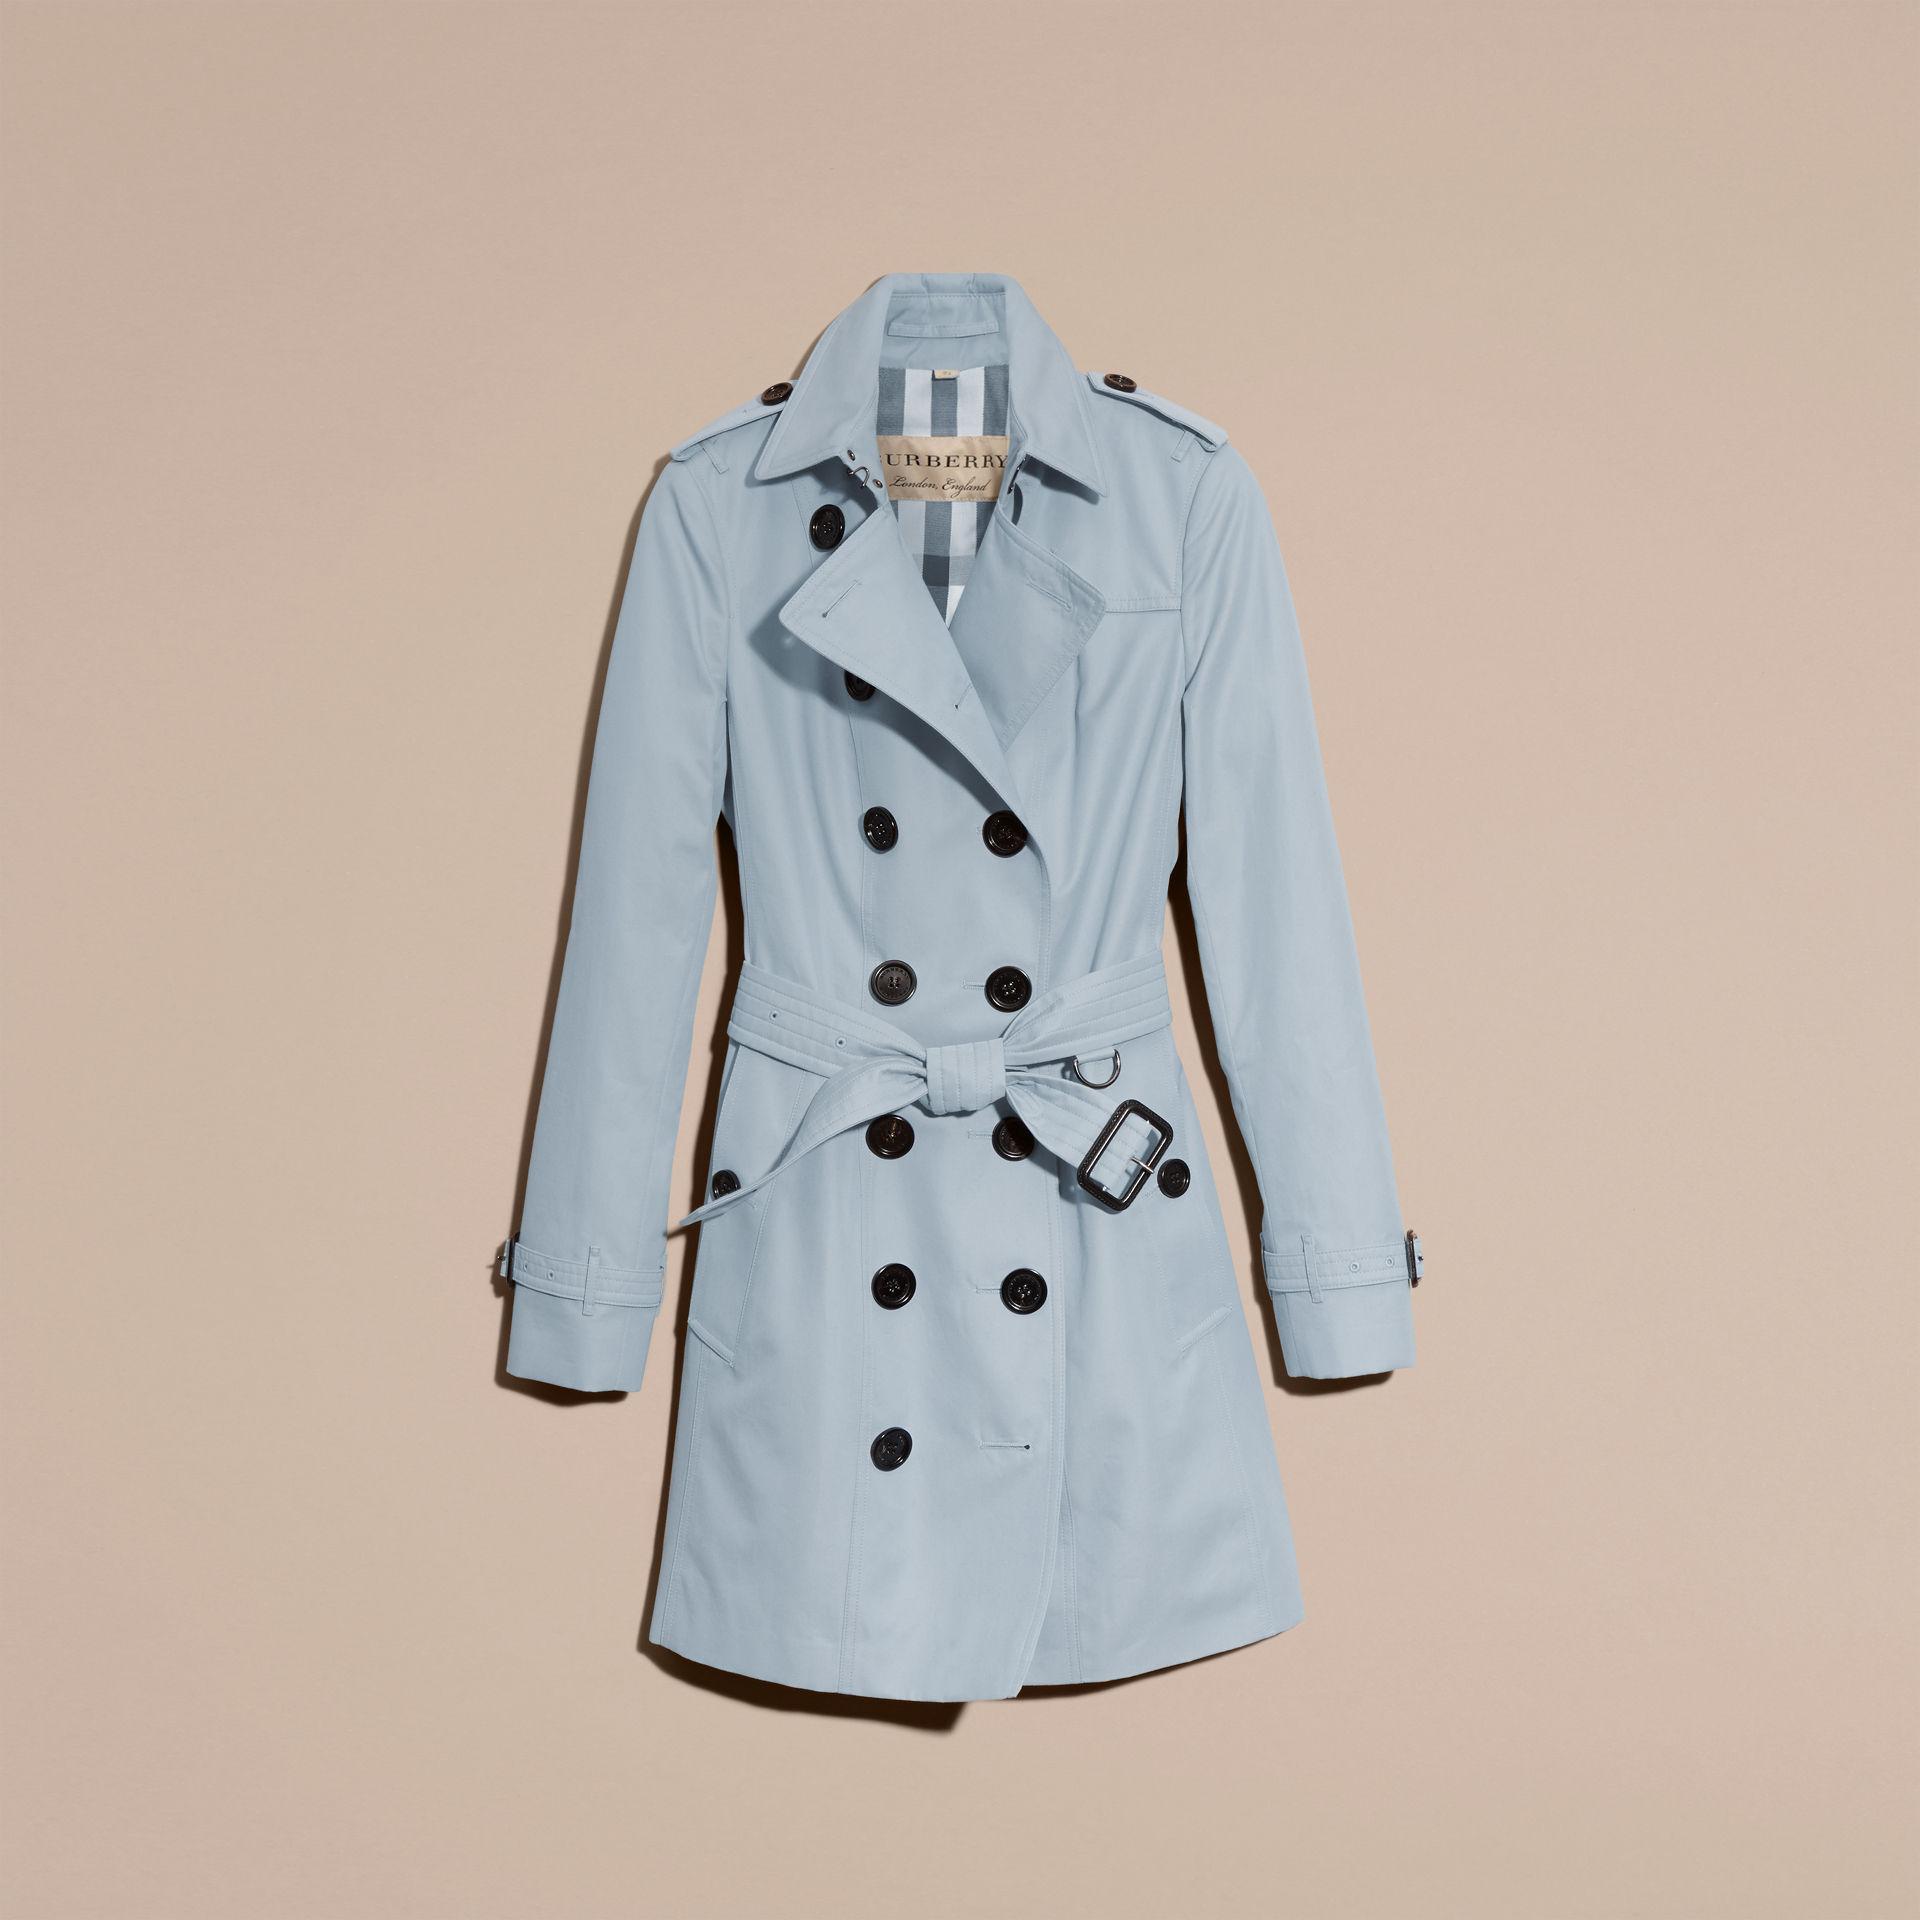 Lyst Burberry Cotton Gabardine Trench Coat Pale Sky Blue